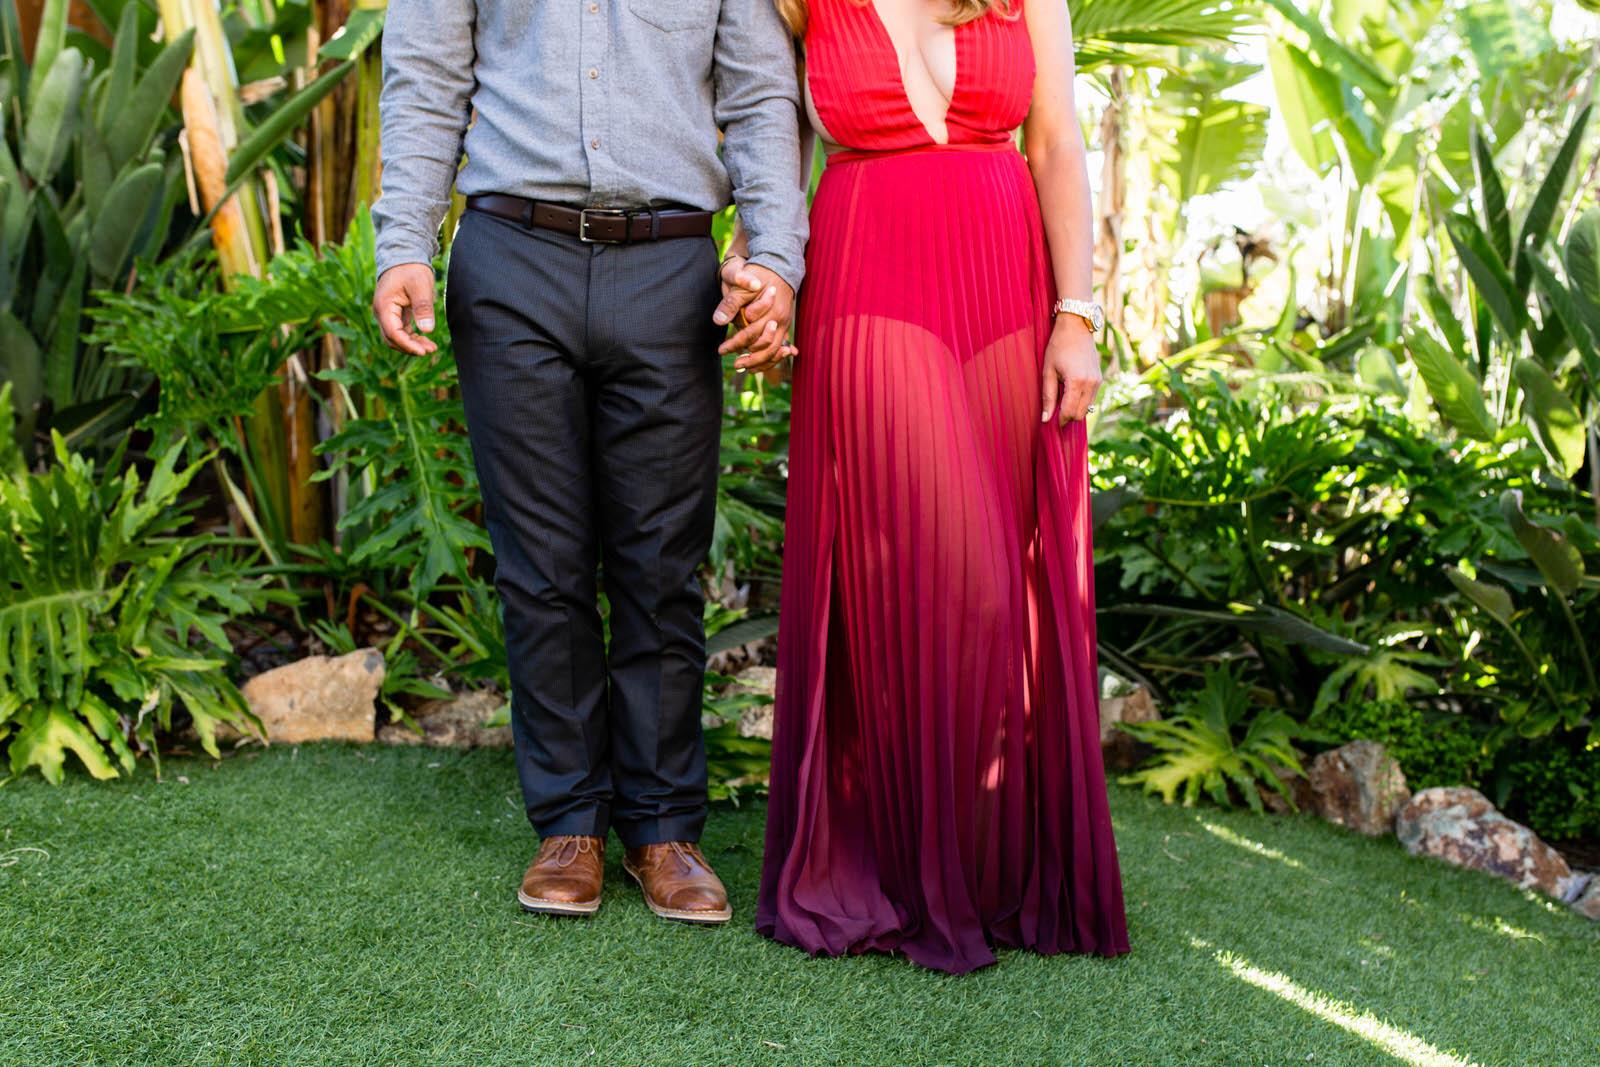 Red Ombre Dress |SamErica Studios